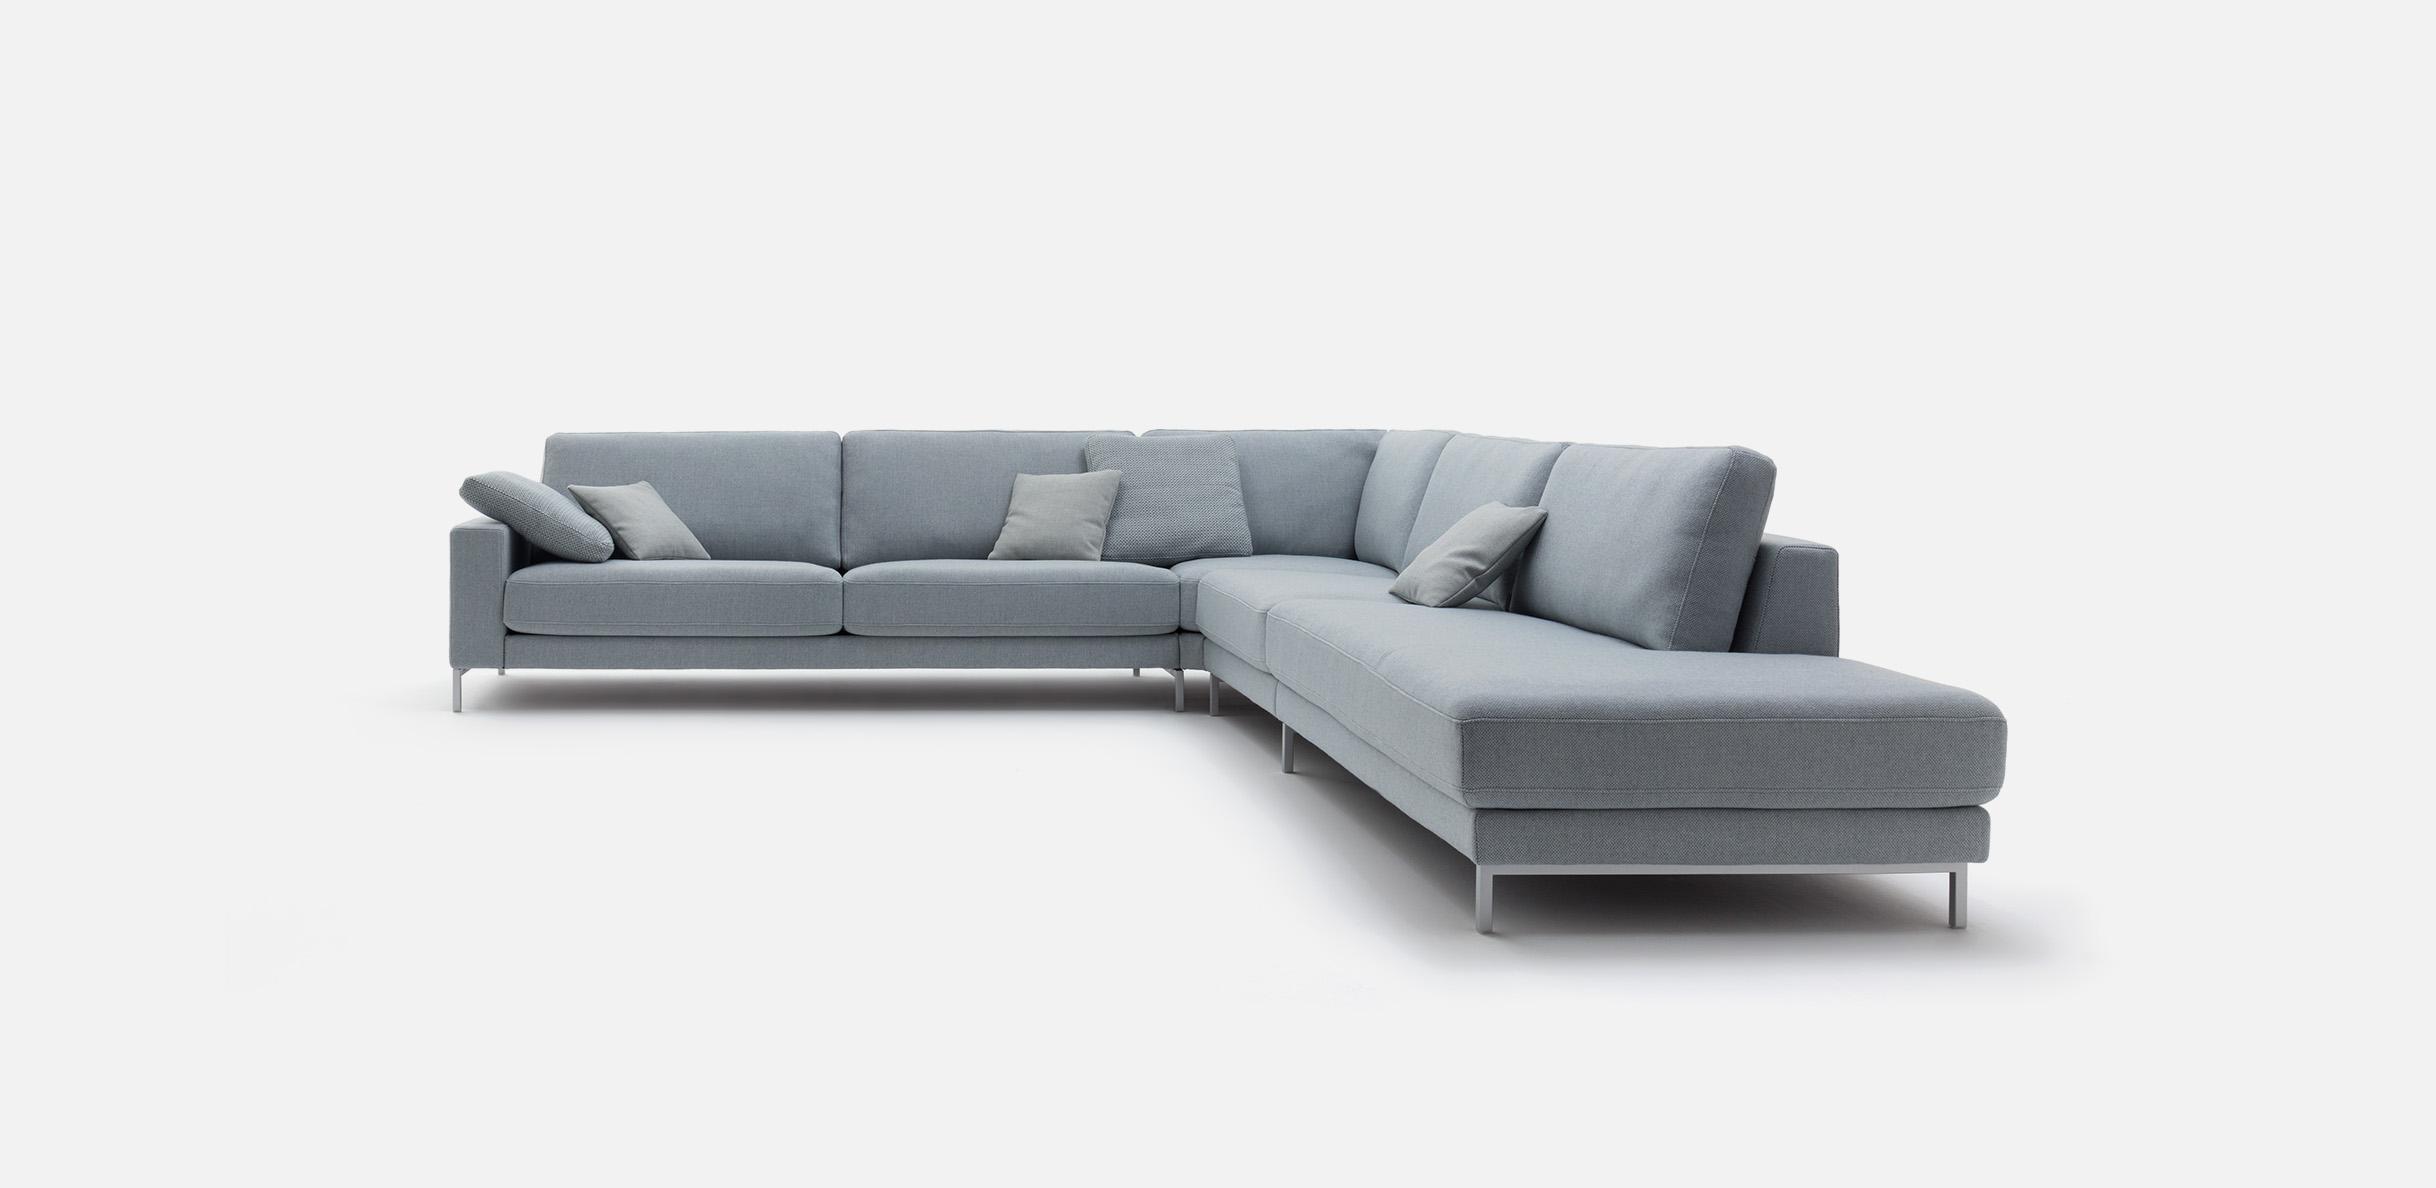 Full Size of Benz Sofa Ego 2019 Garnitur 2 Teilig Machalke Abnehmbarer Bezug Relaxfunktion Xxxl Grünes Günstige Reiniger Freistil Big Braun Sofa Benz Sofa